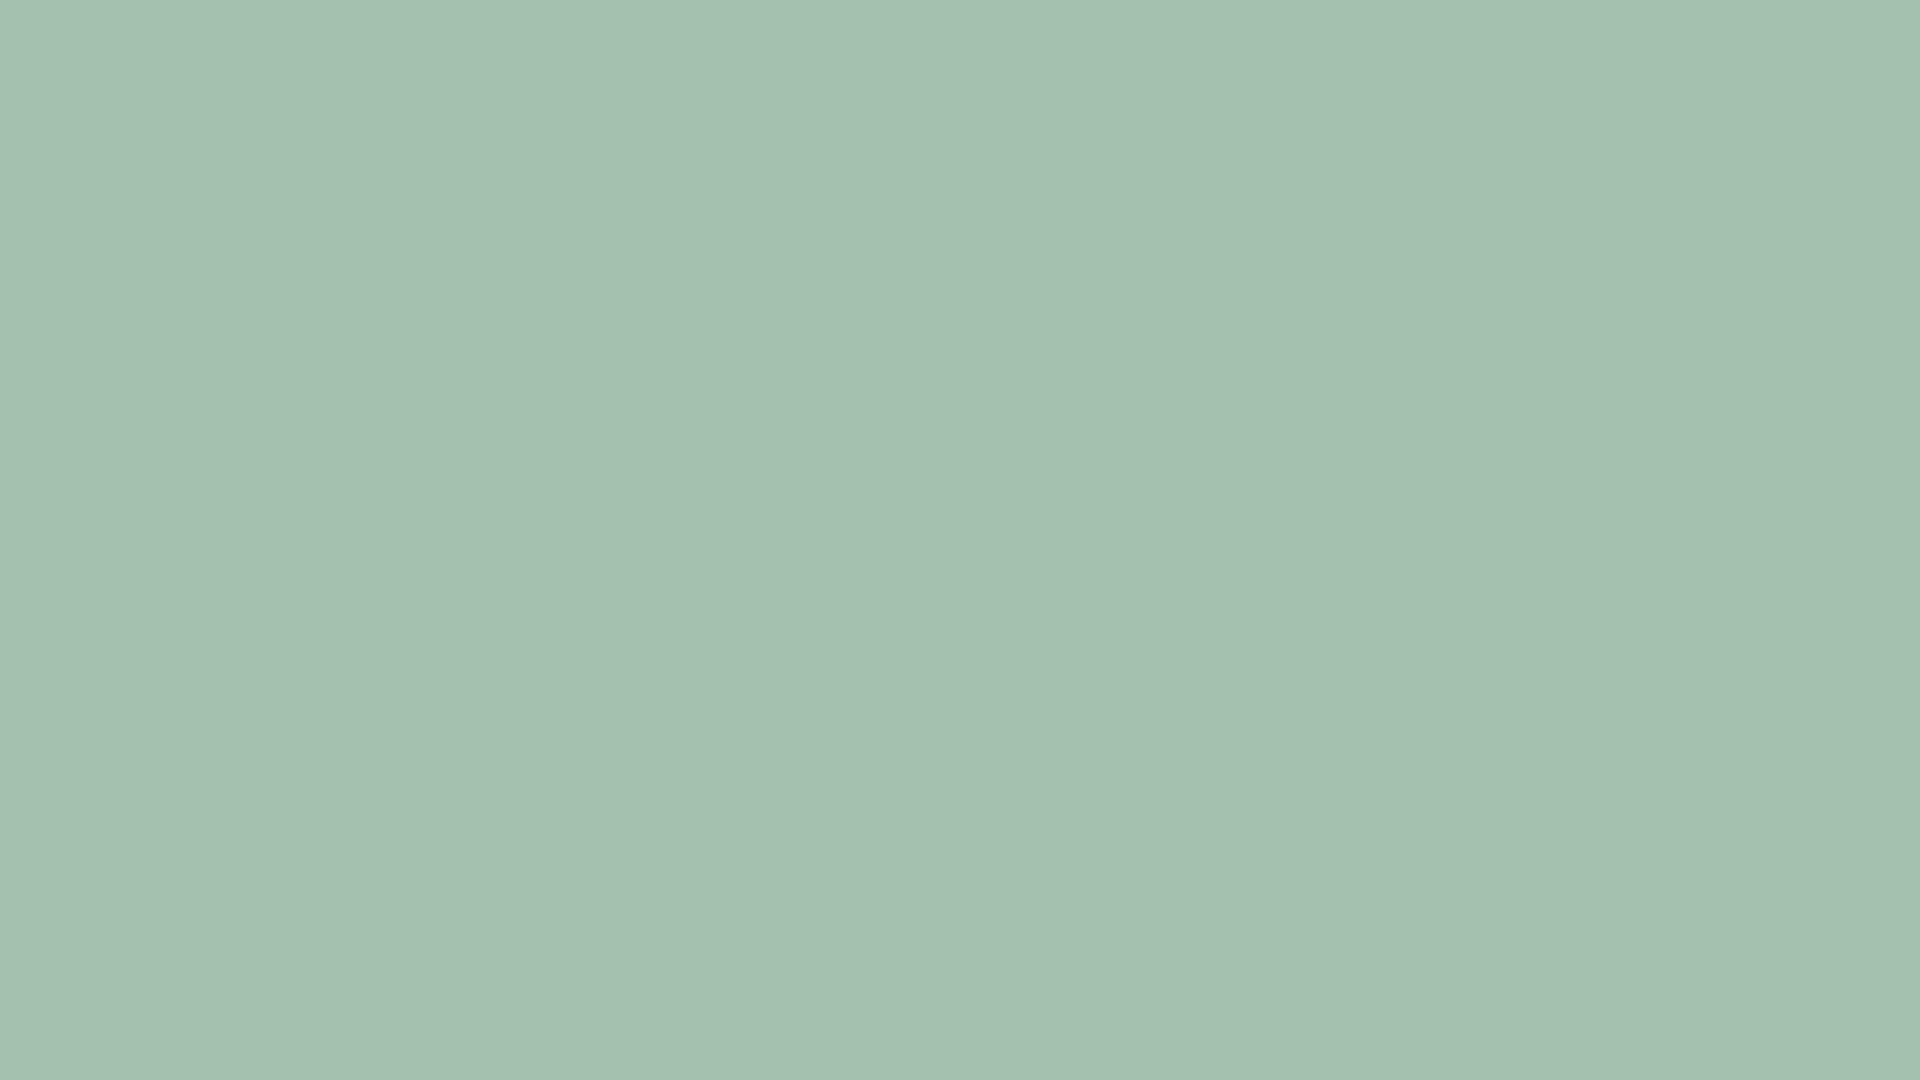 1920x1080 Cambridge Blue Solid Color Background